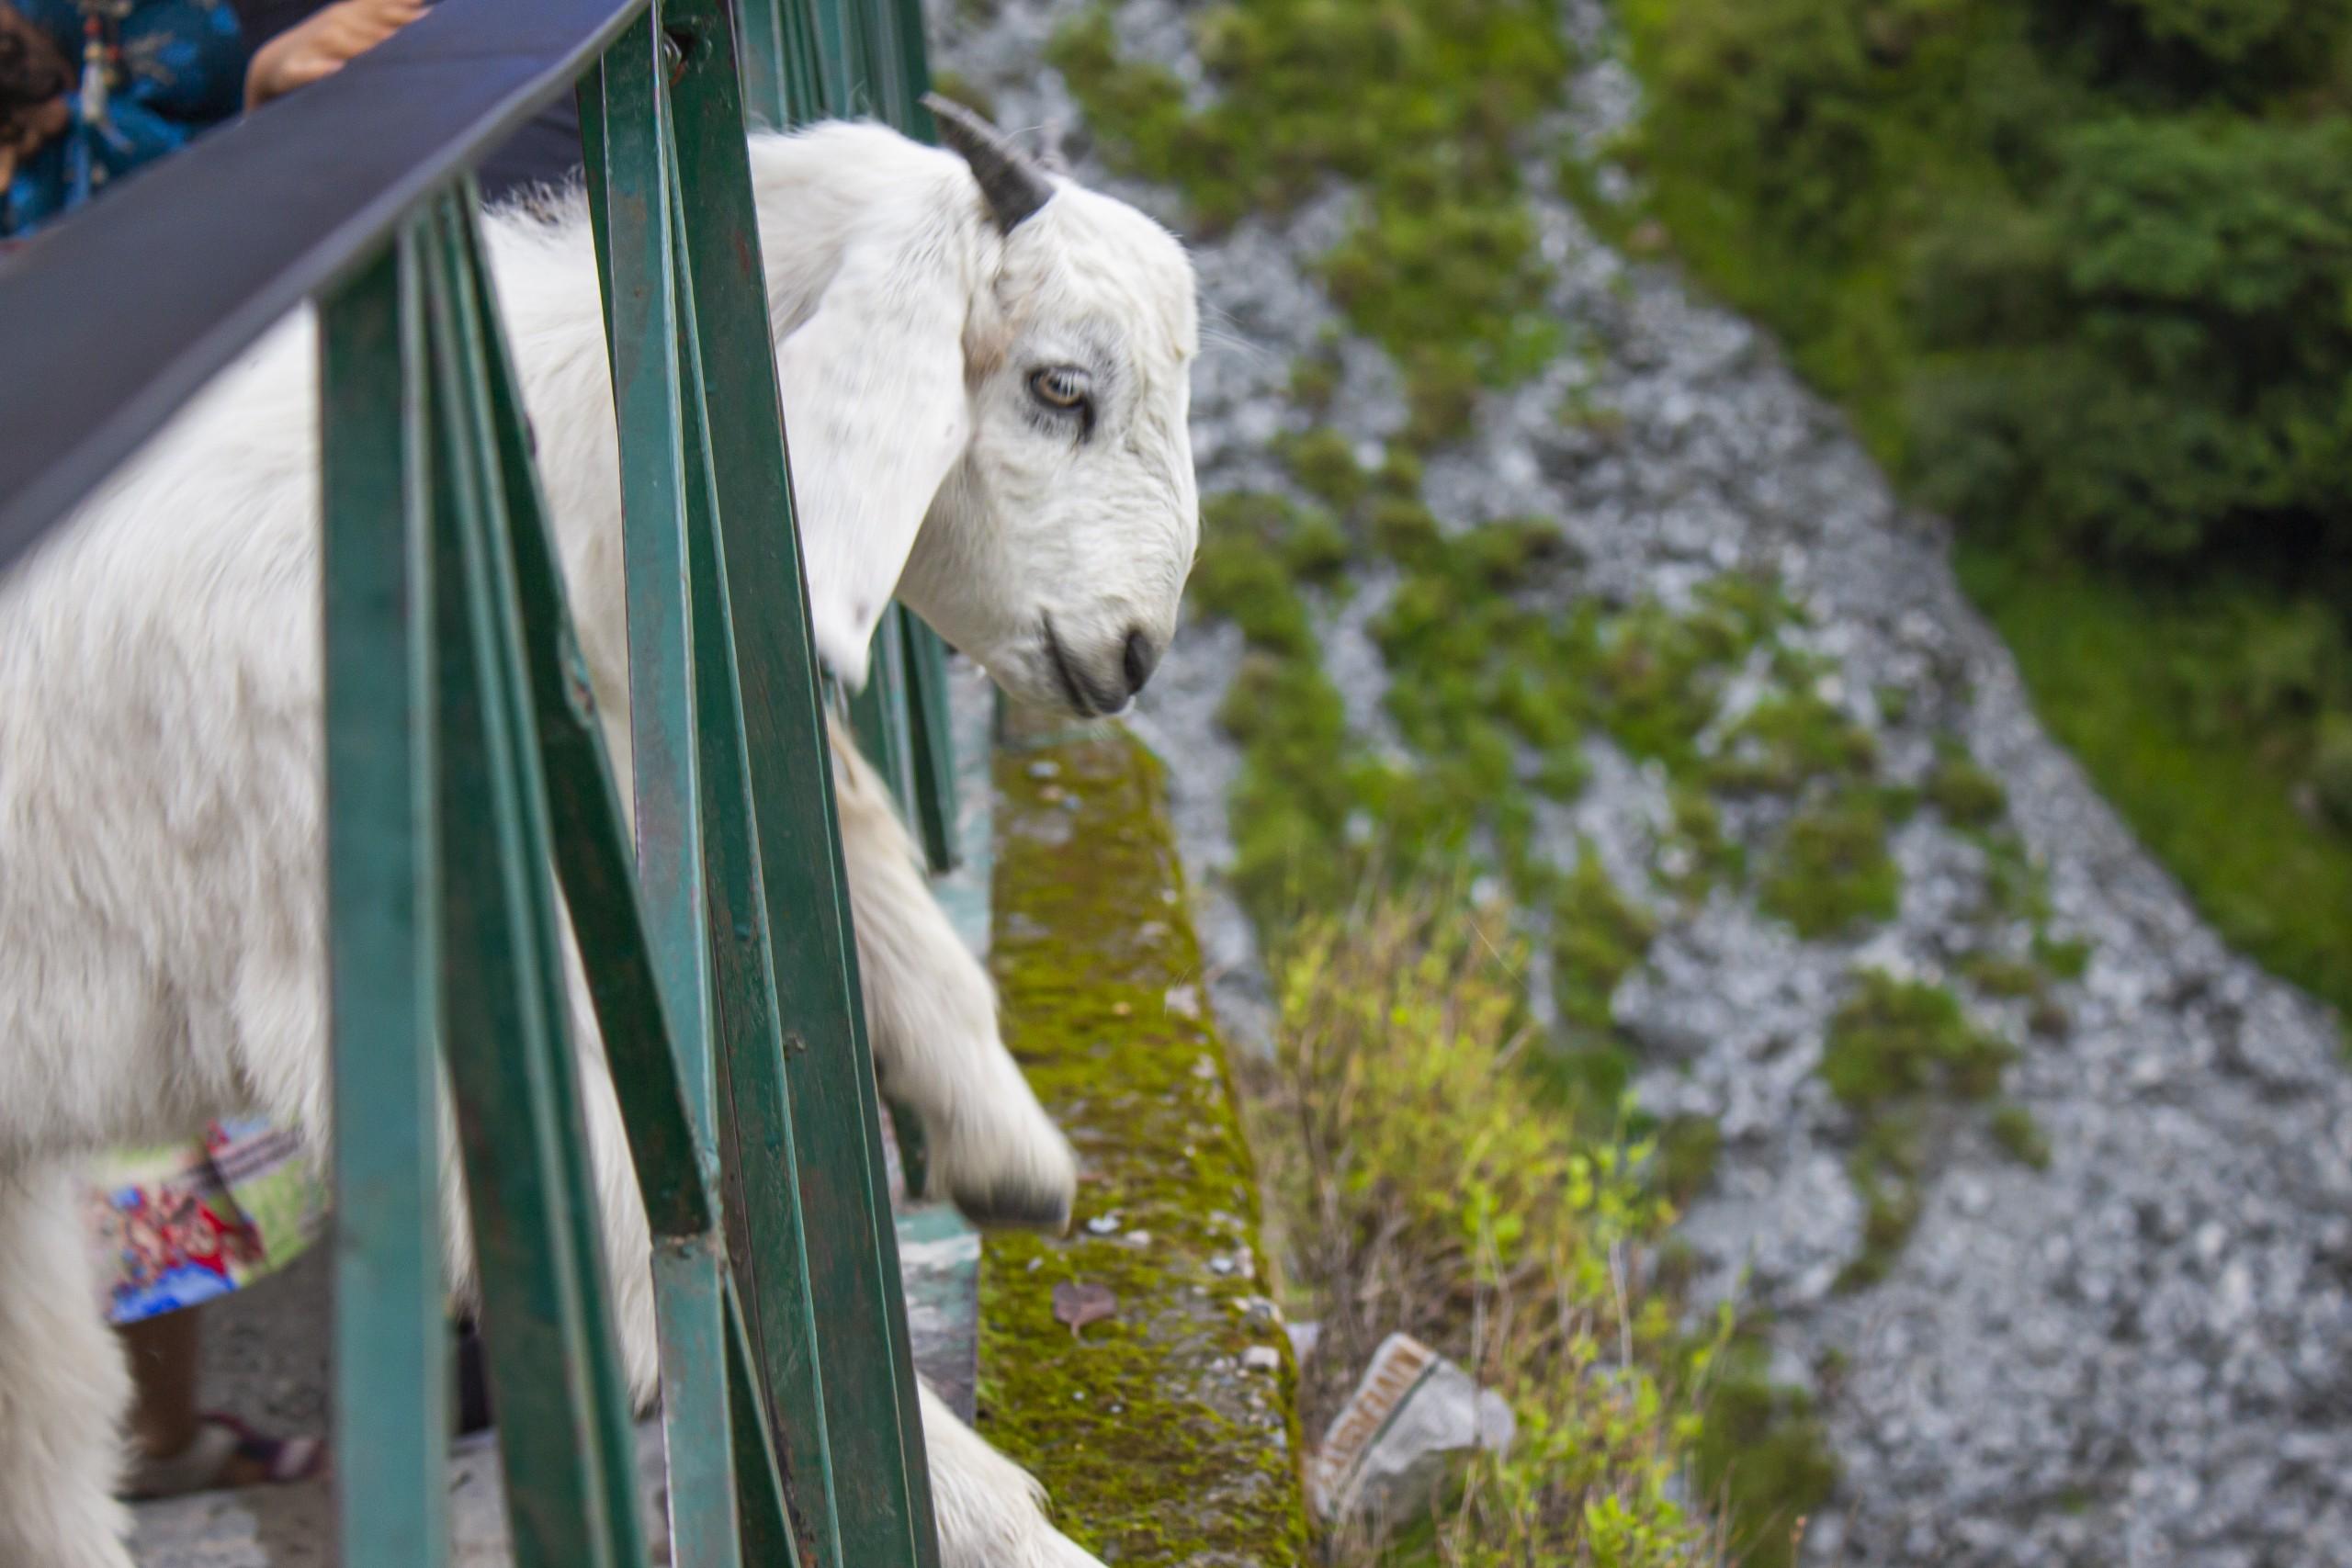 Goat peeking out on a railing